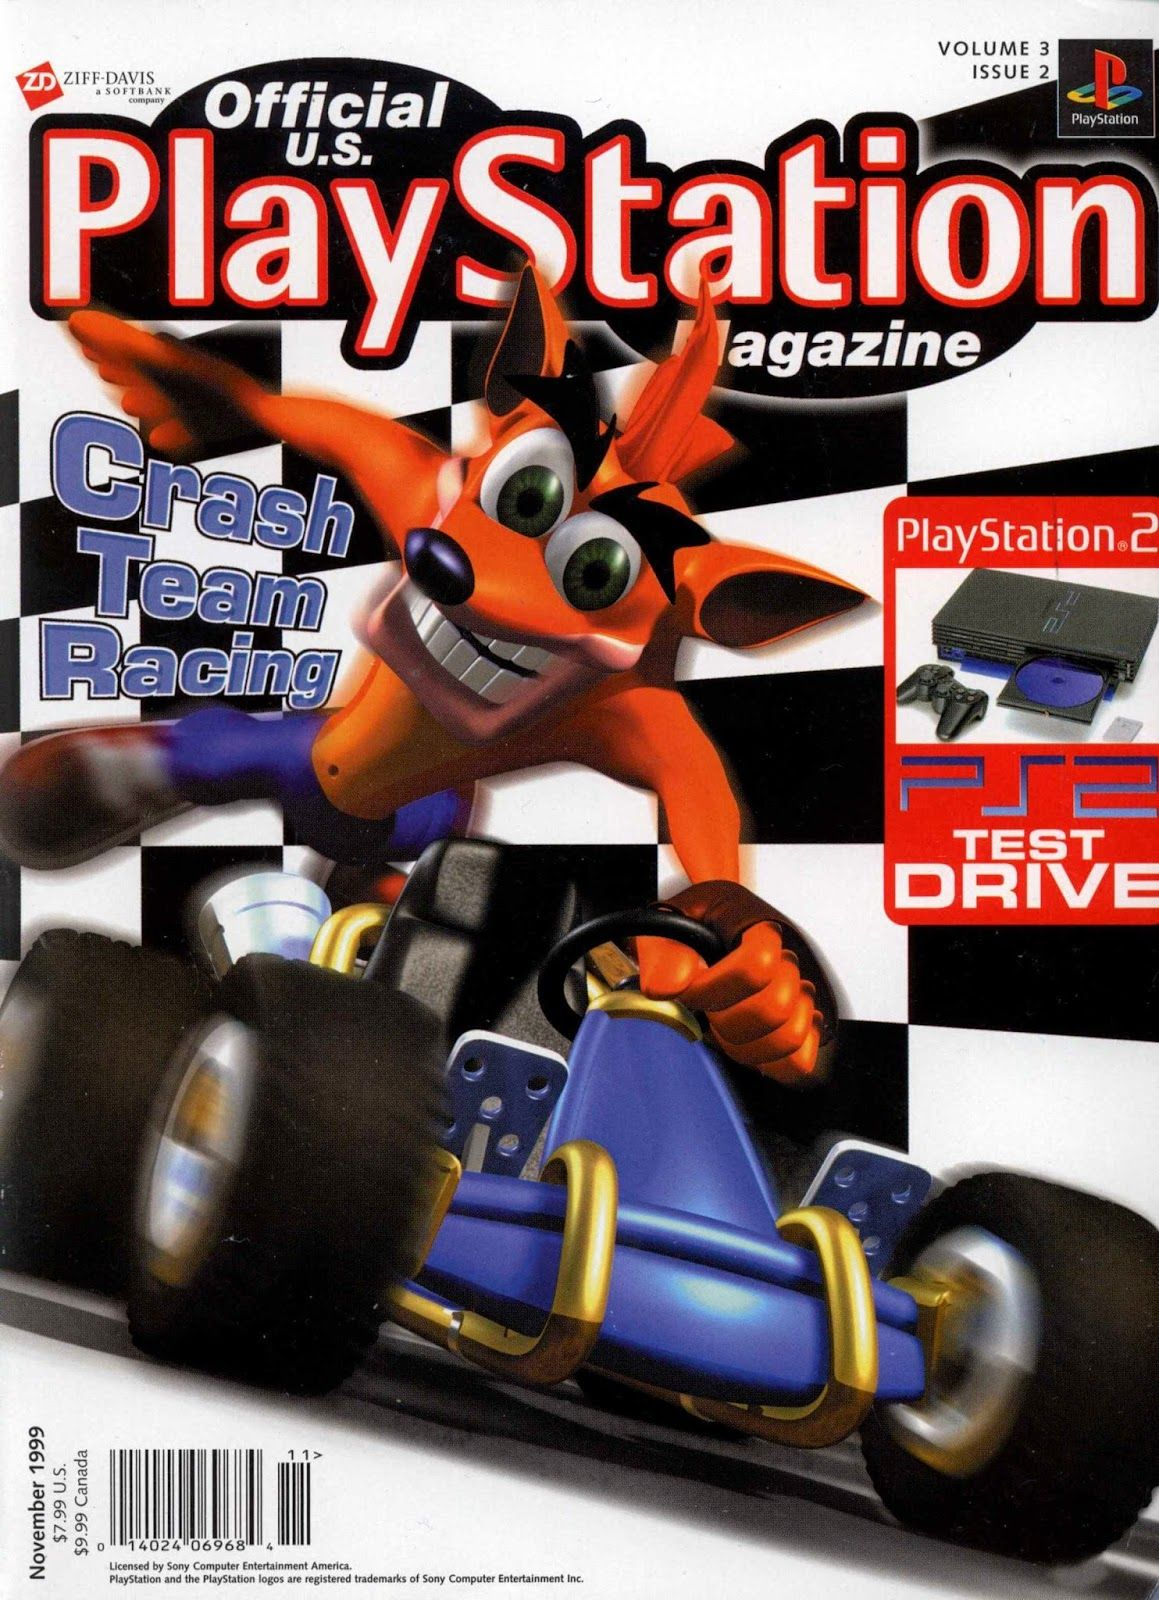 Official U.S. PlayStation Magazine, November 1999 | Gaming Magazines ...